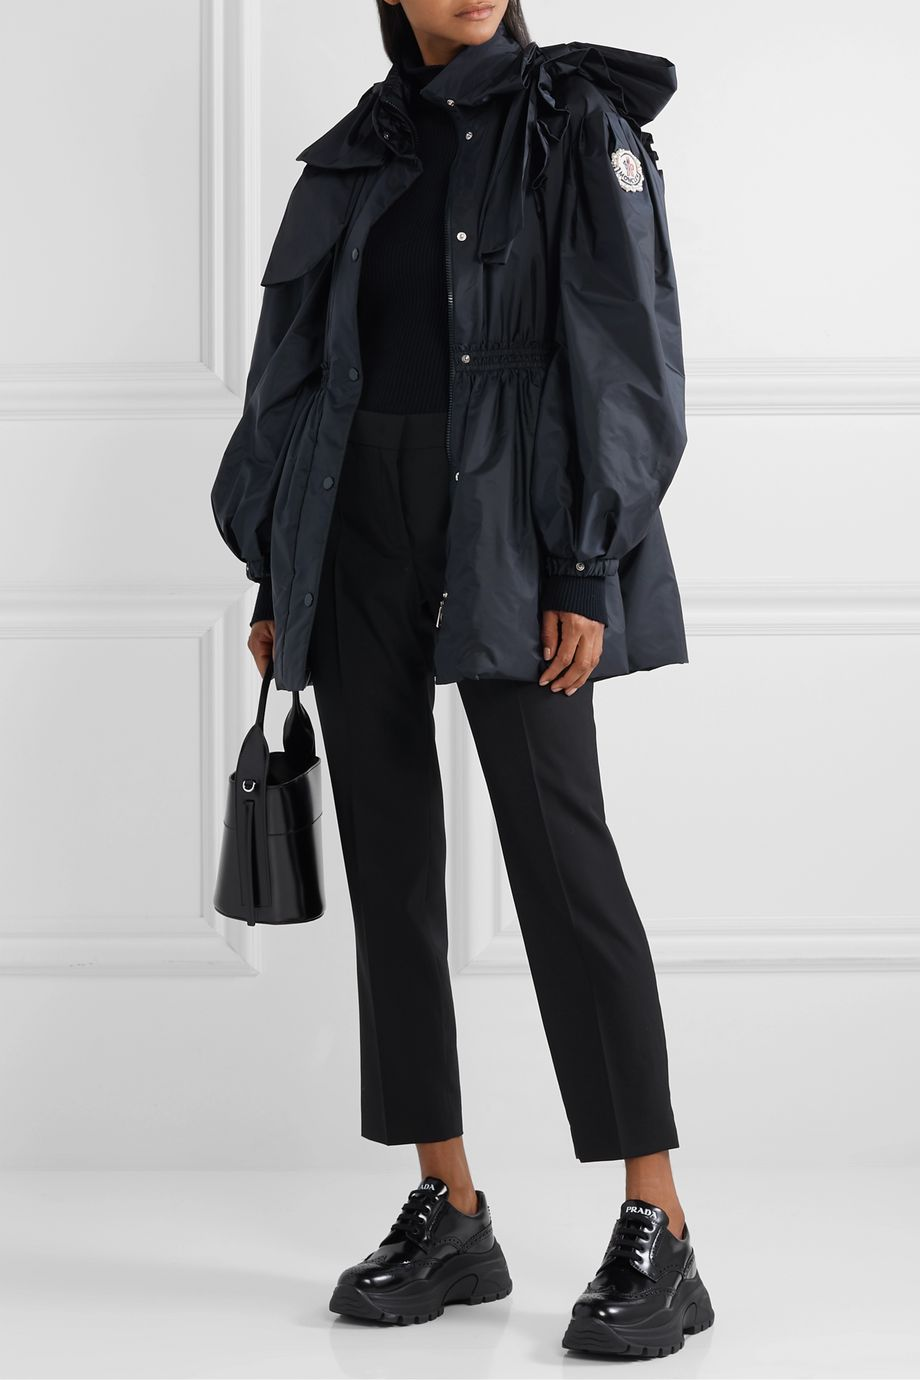 Moncler Genius + 4 Simone Rocha Susan bow-embellished shell down jacket